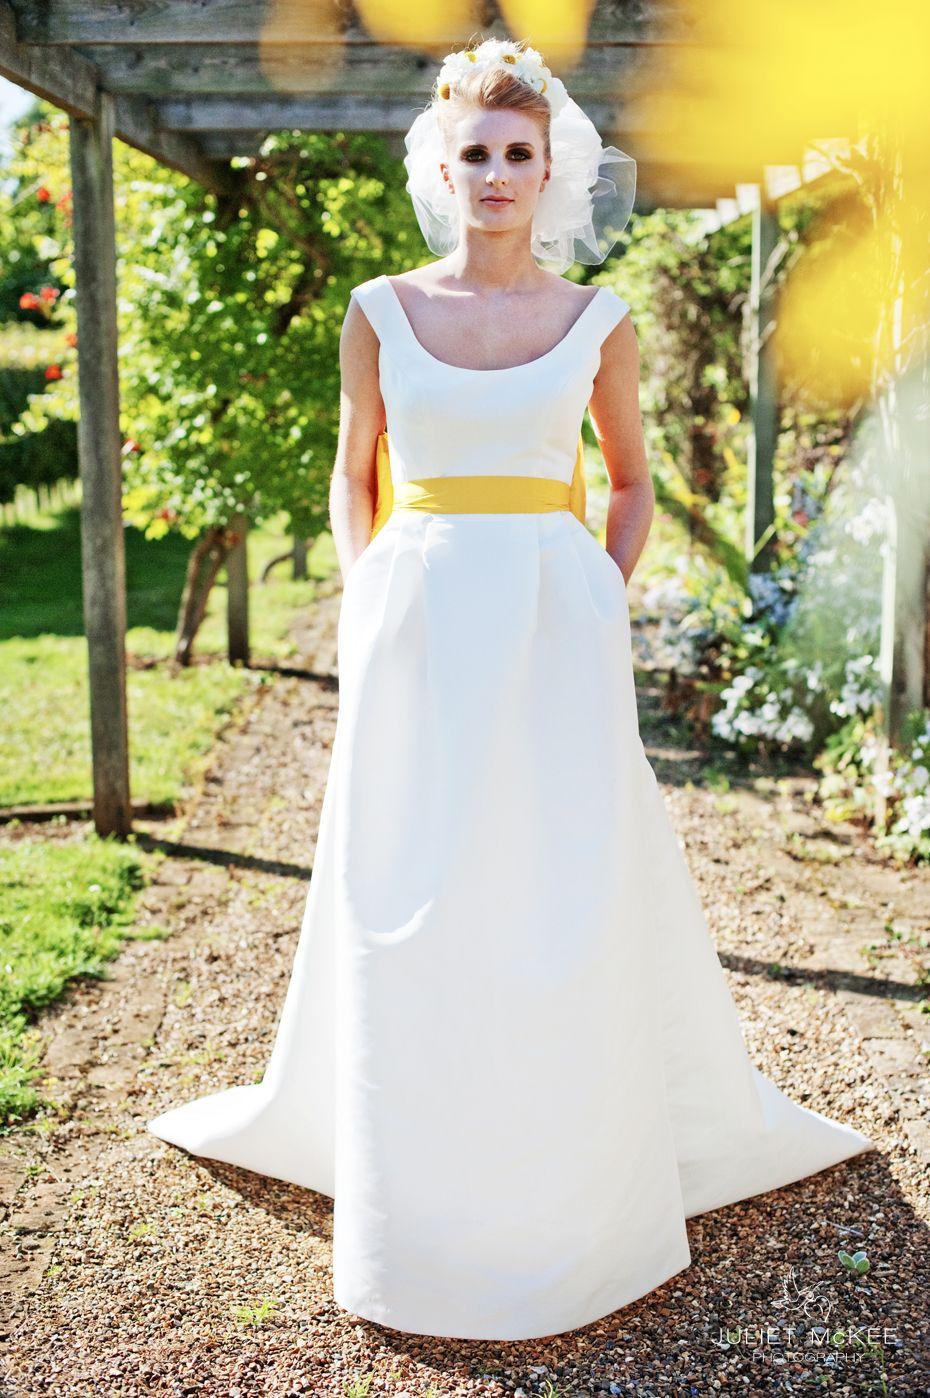 Wedding gown with red accents  Lemon zest wedding theme Yellow bridal sash Yellow themed wedding